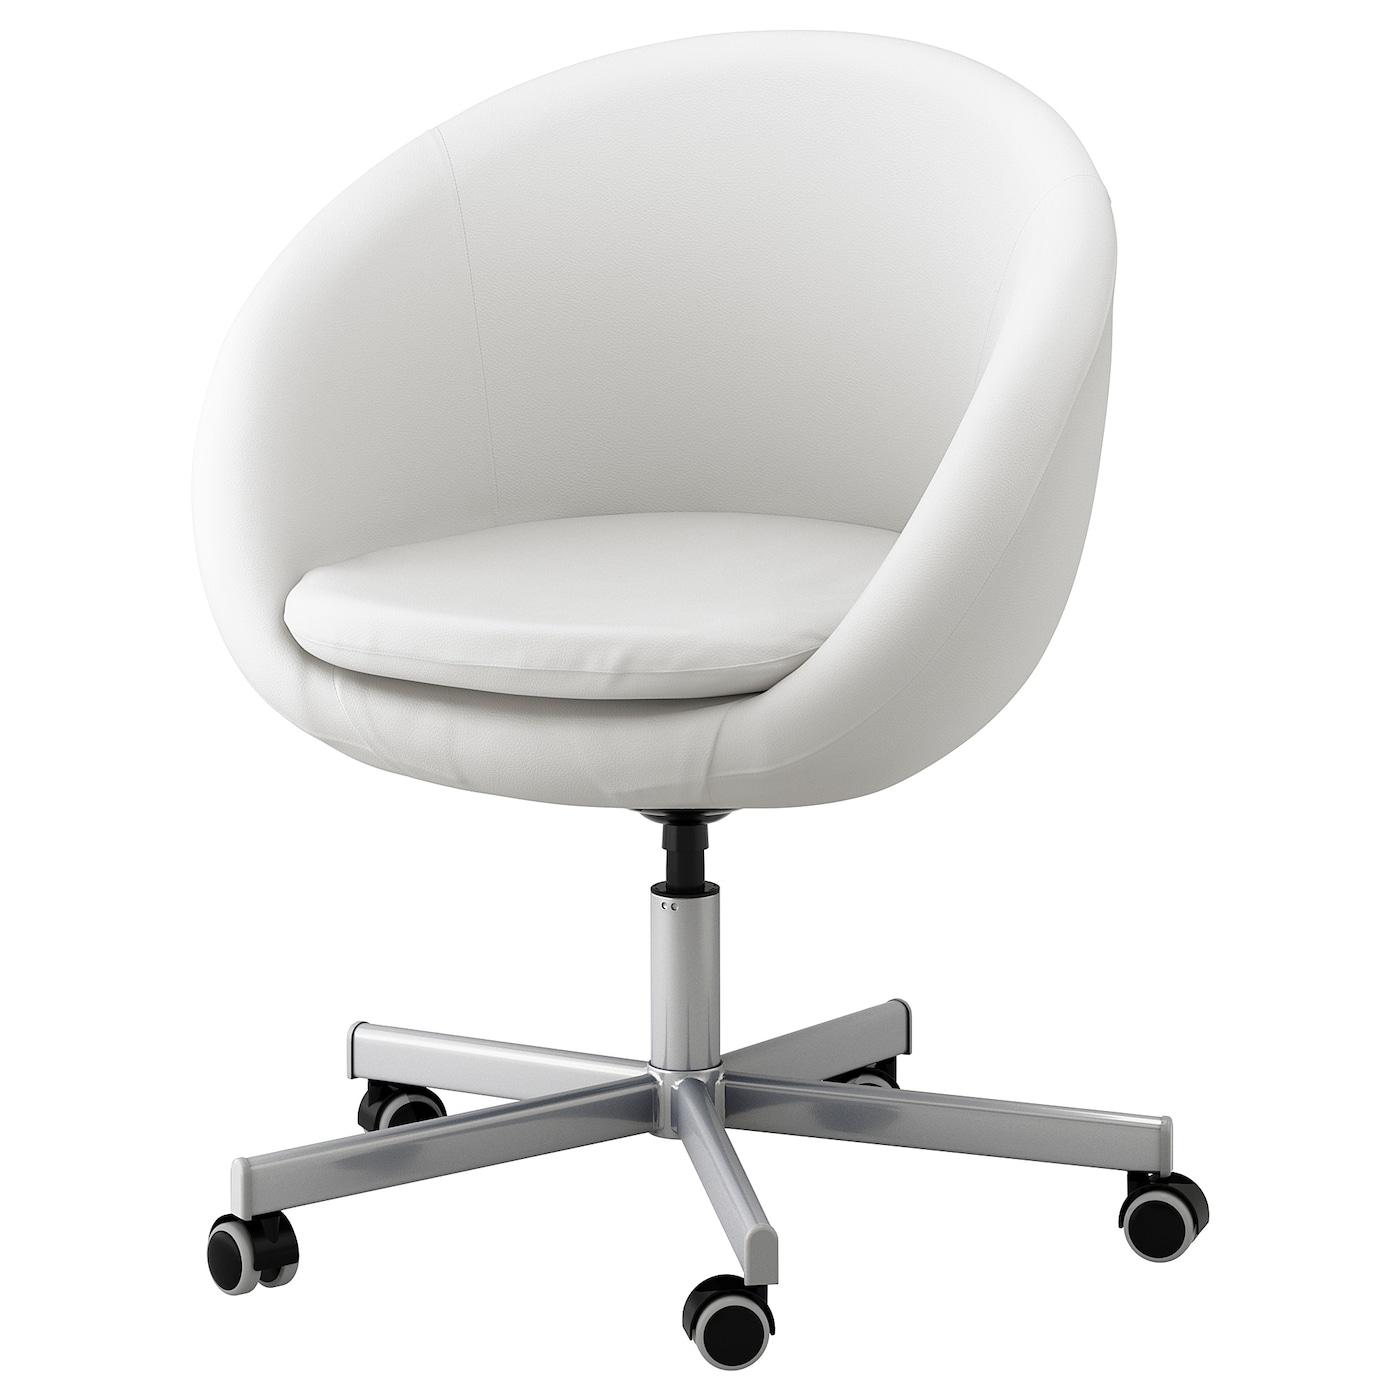 Skruvsta swivel chair idhult white ikea - Ikea chaise pour salle a manger ...